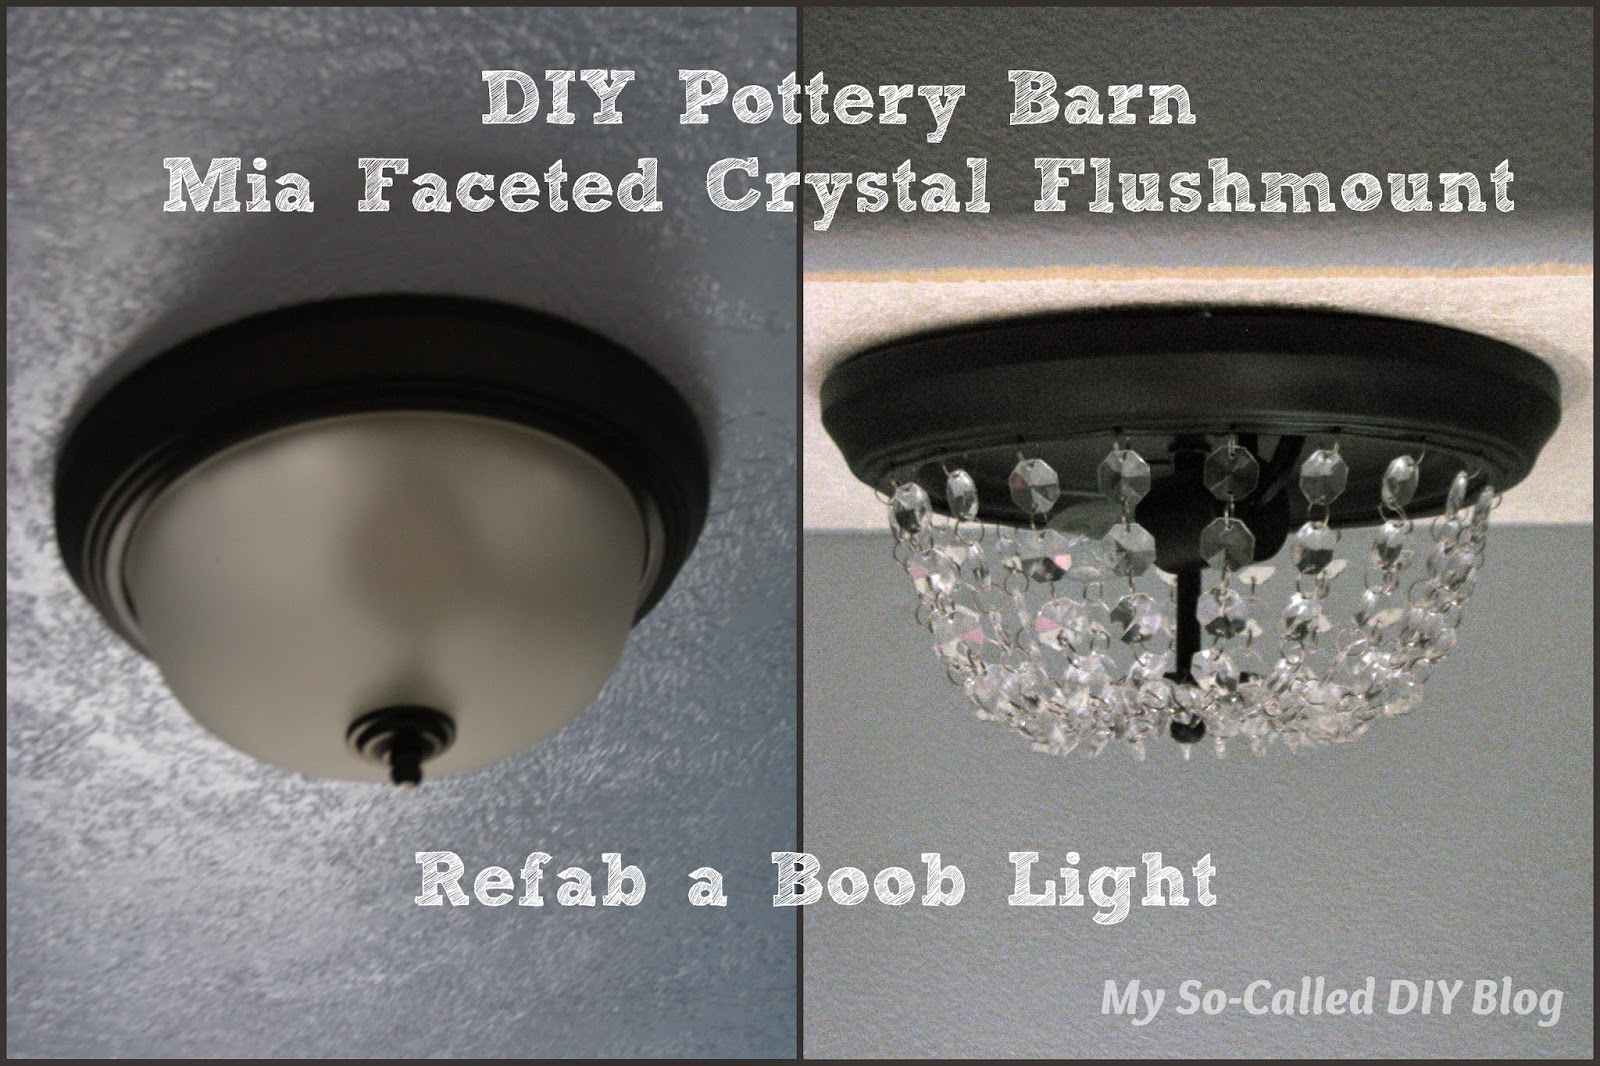 DIY Pottery Barn Mia Faceted Crystal Flushmount/ Refab A Boob Light